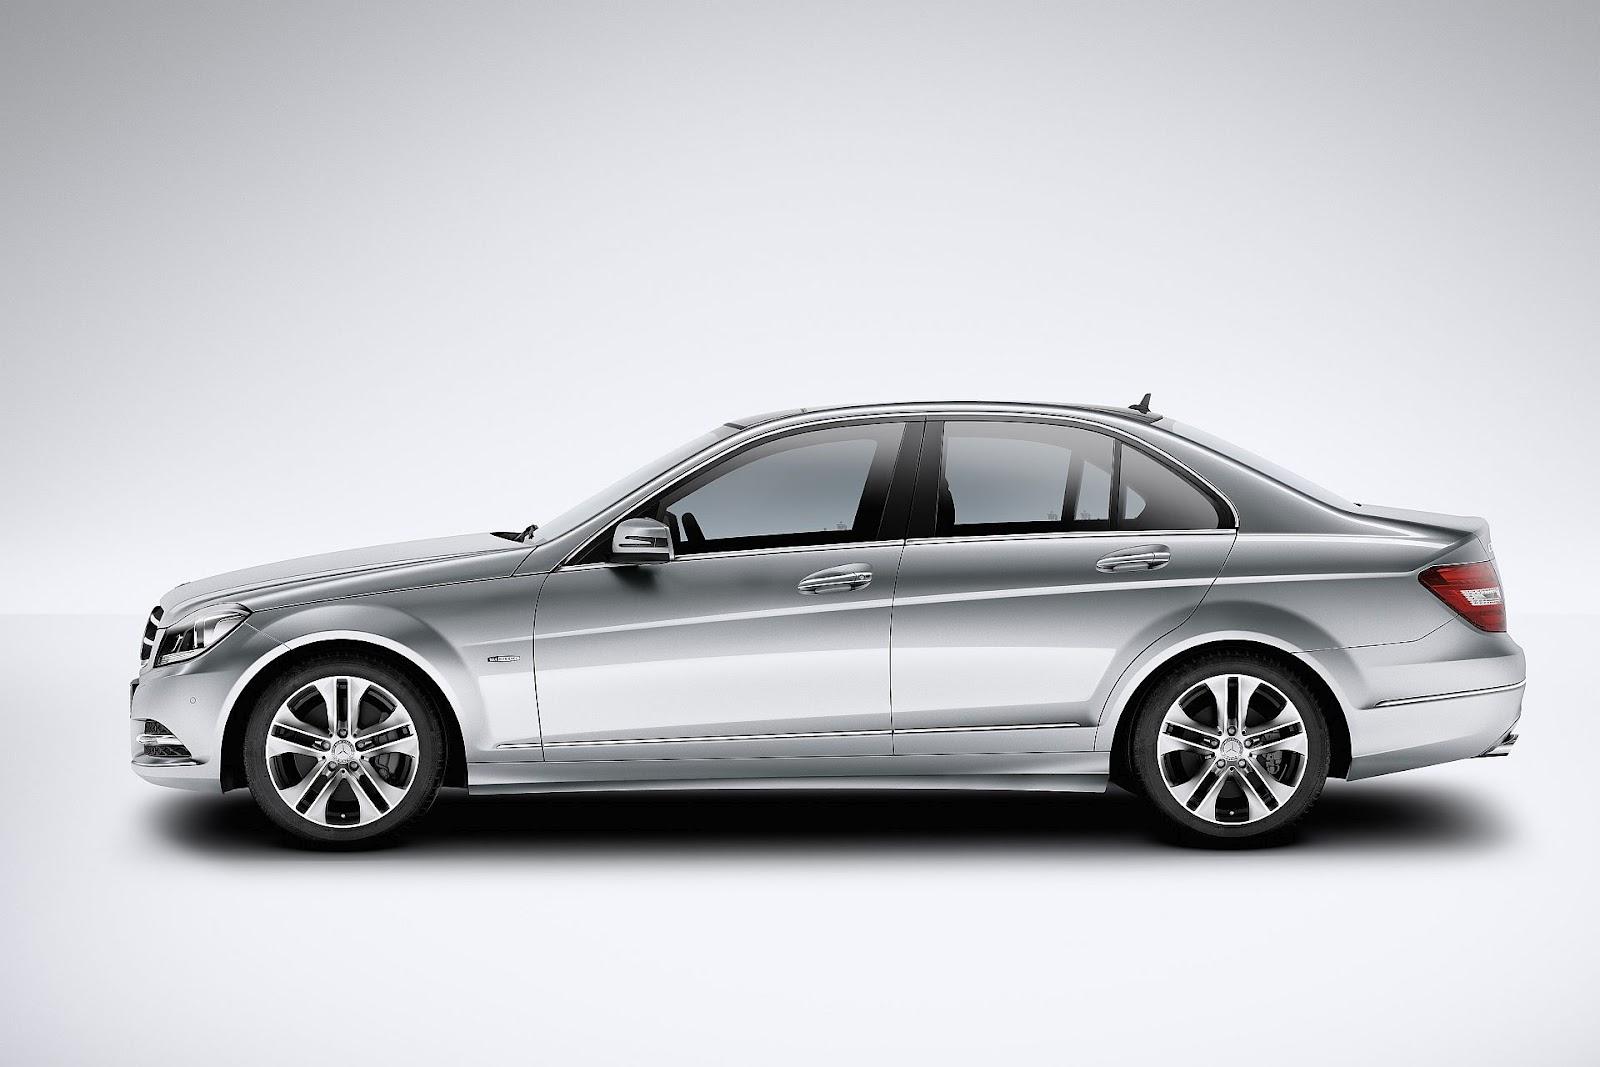 Mercedes benz elite training program for Mercedes benz training program